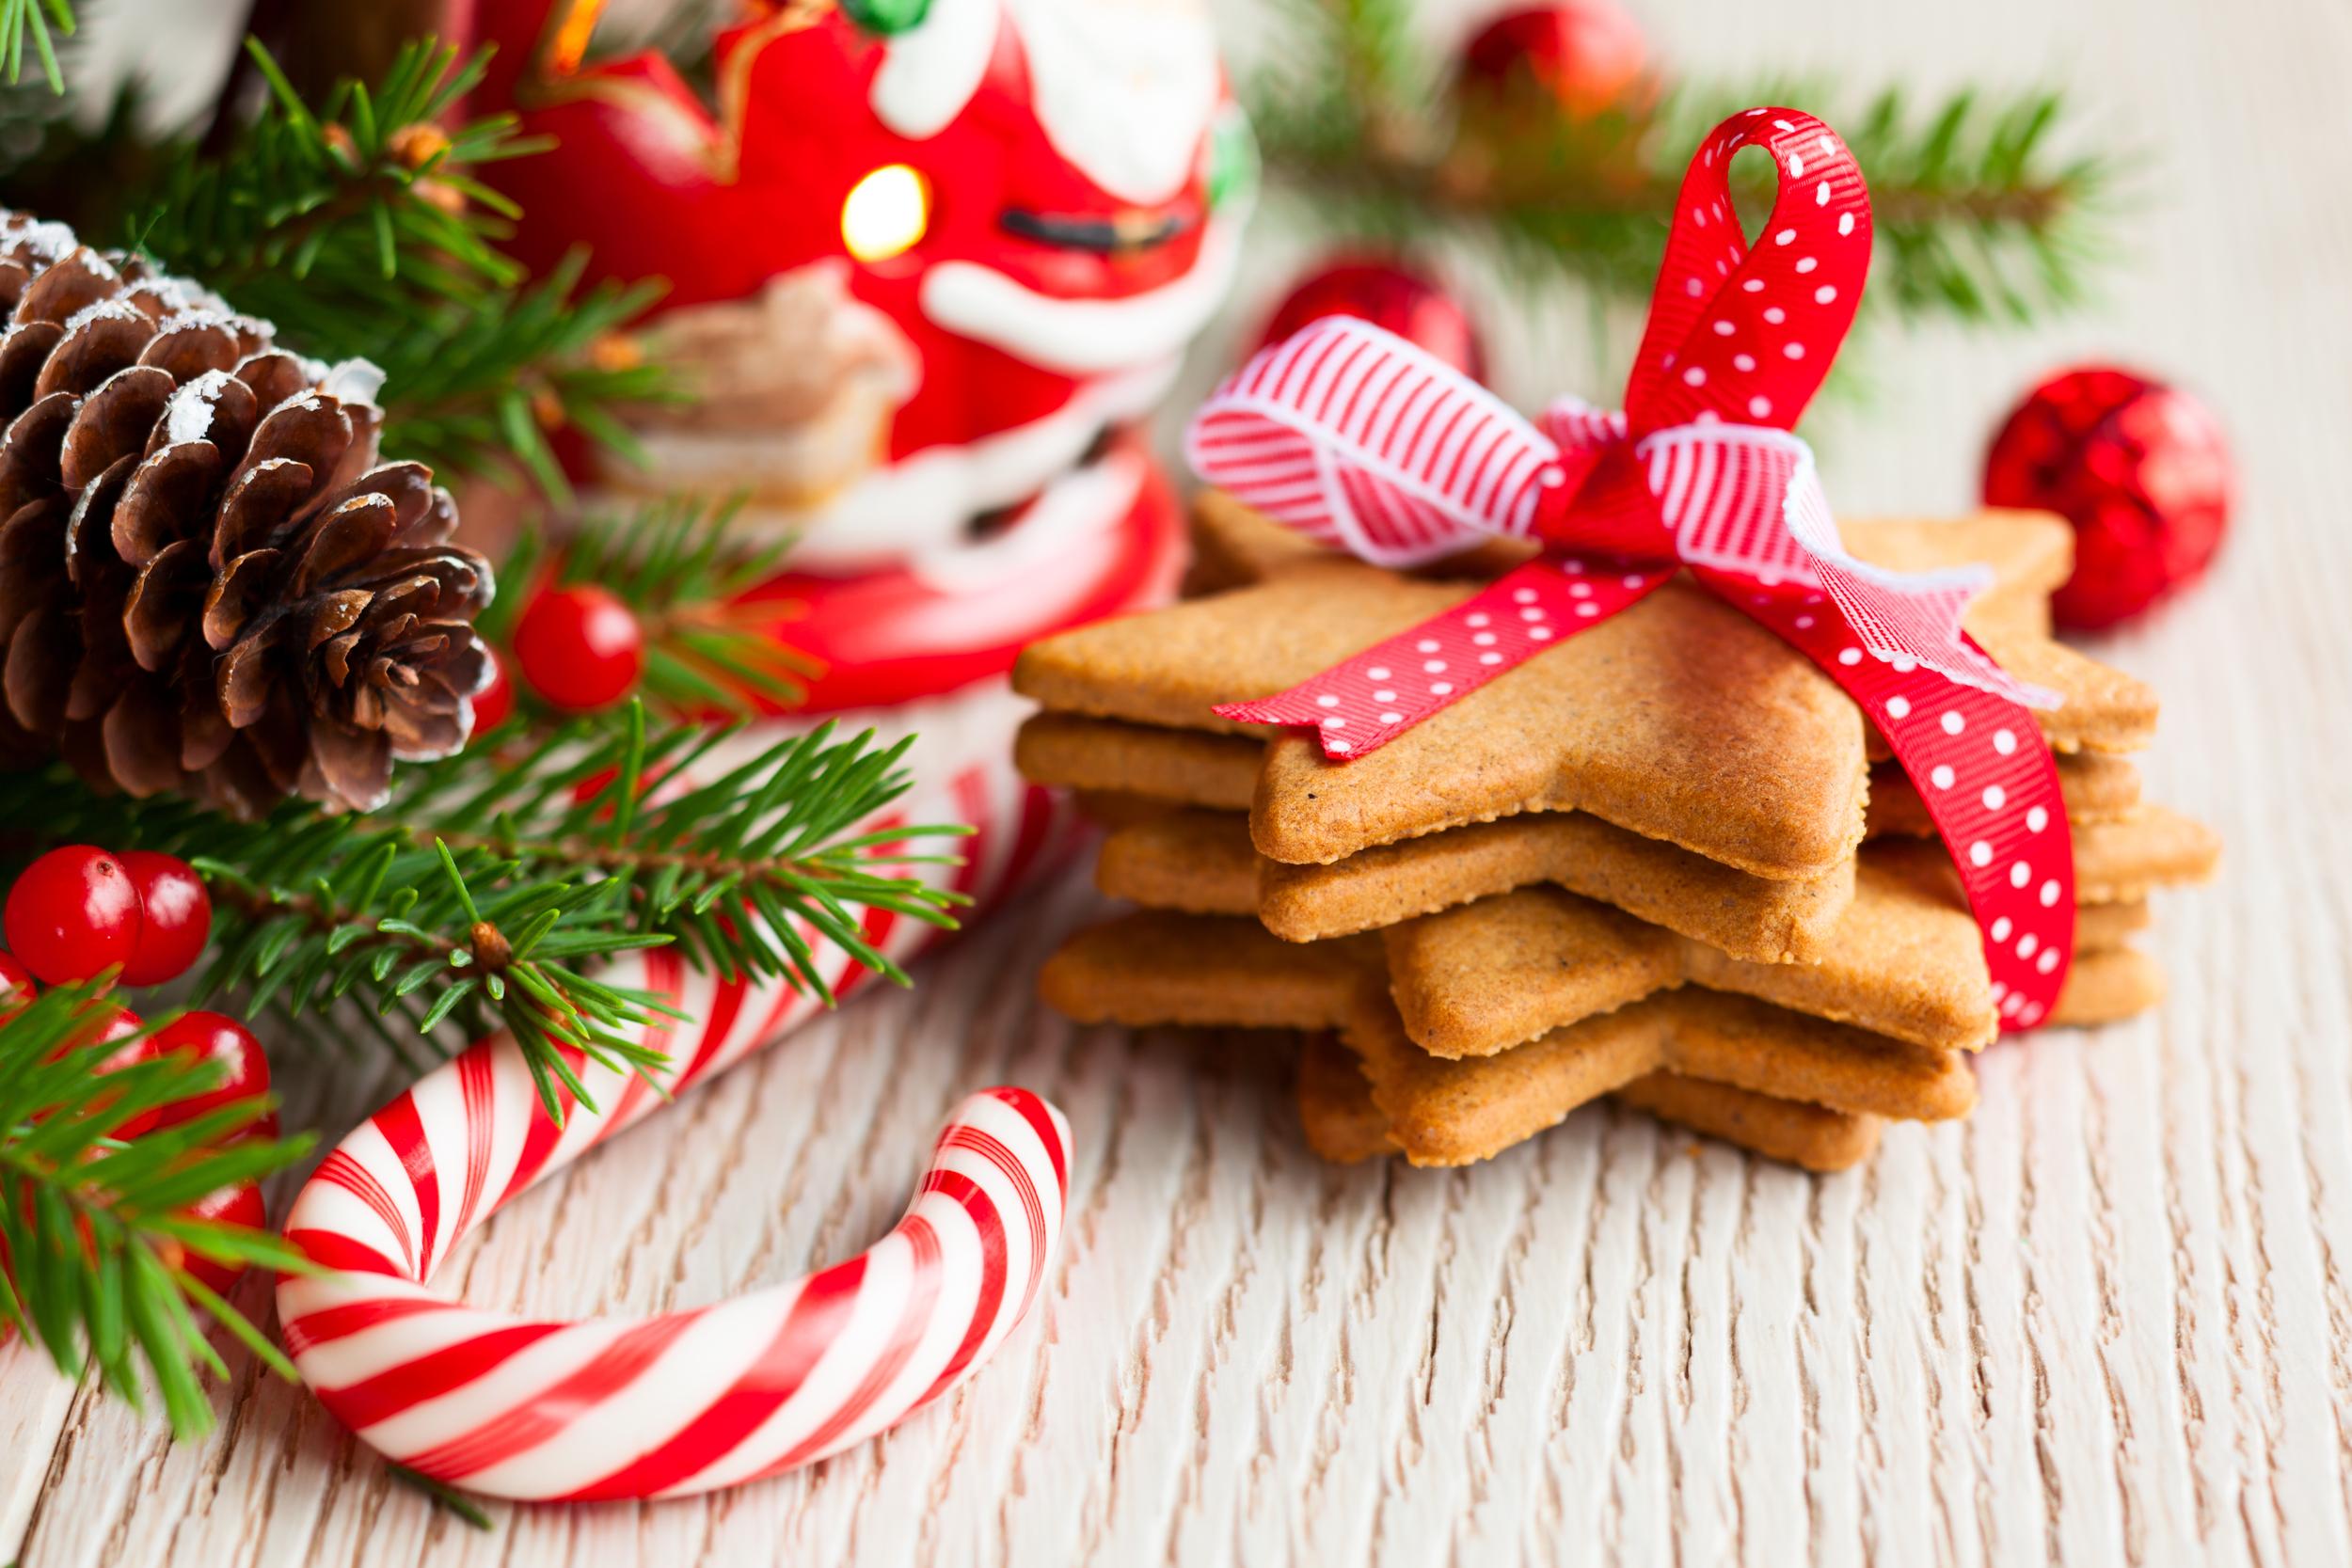 Christmas cookies. Source: sarsmis/Shutterstock.com